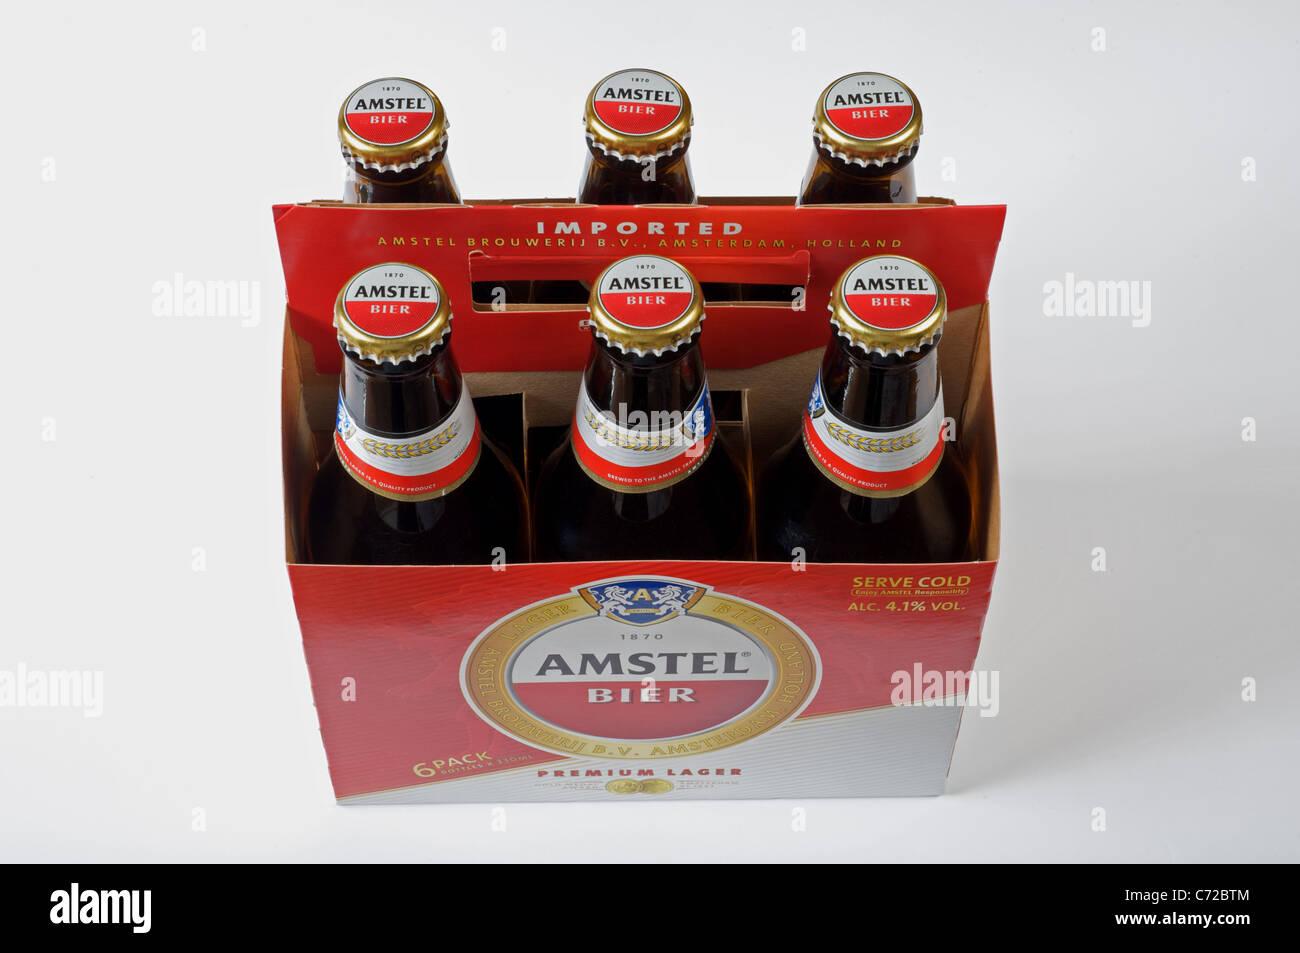 Amstel beer six-pack - Stock Image